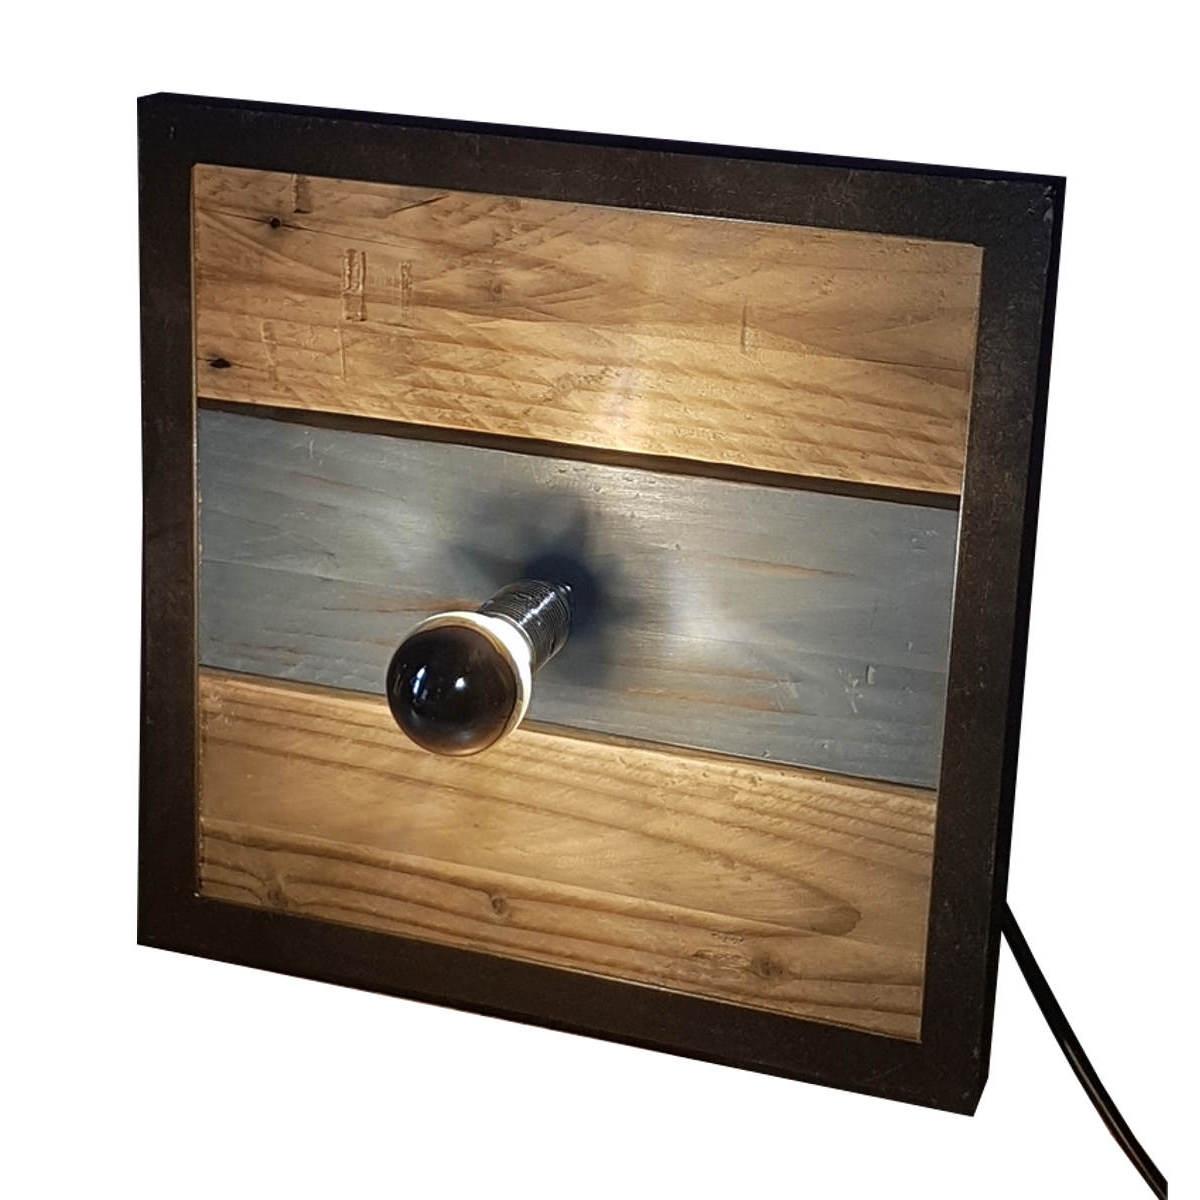 lampe design belge applique murale m tal 01 axel rons. Black Bedroom Furniture Sets. Home Design Ideas